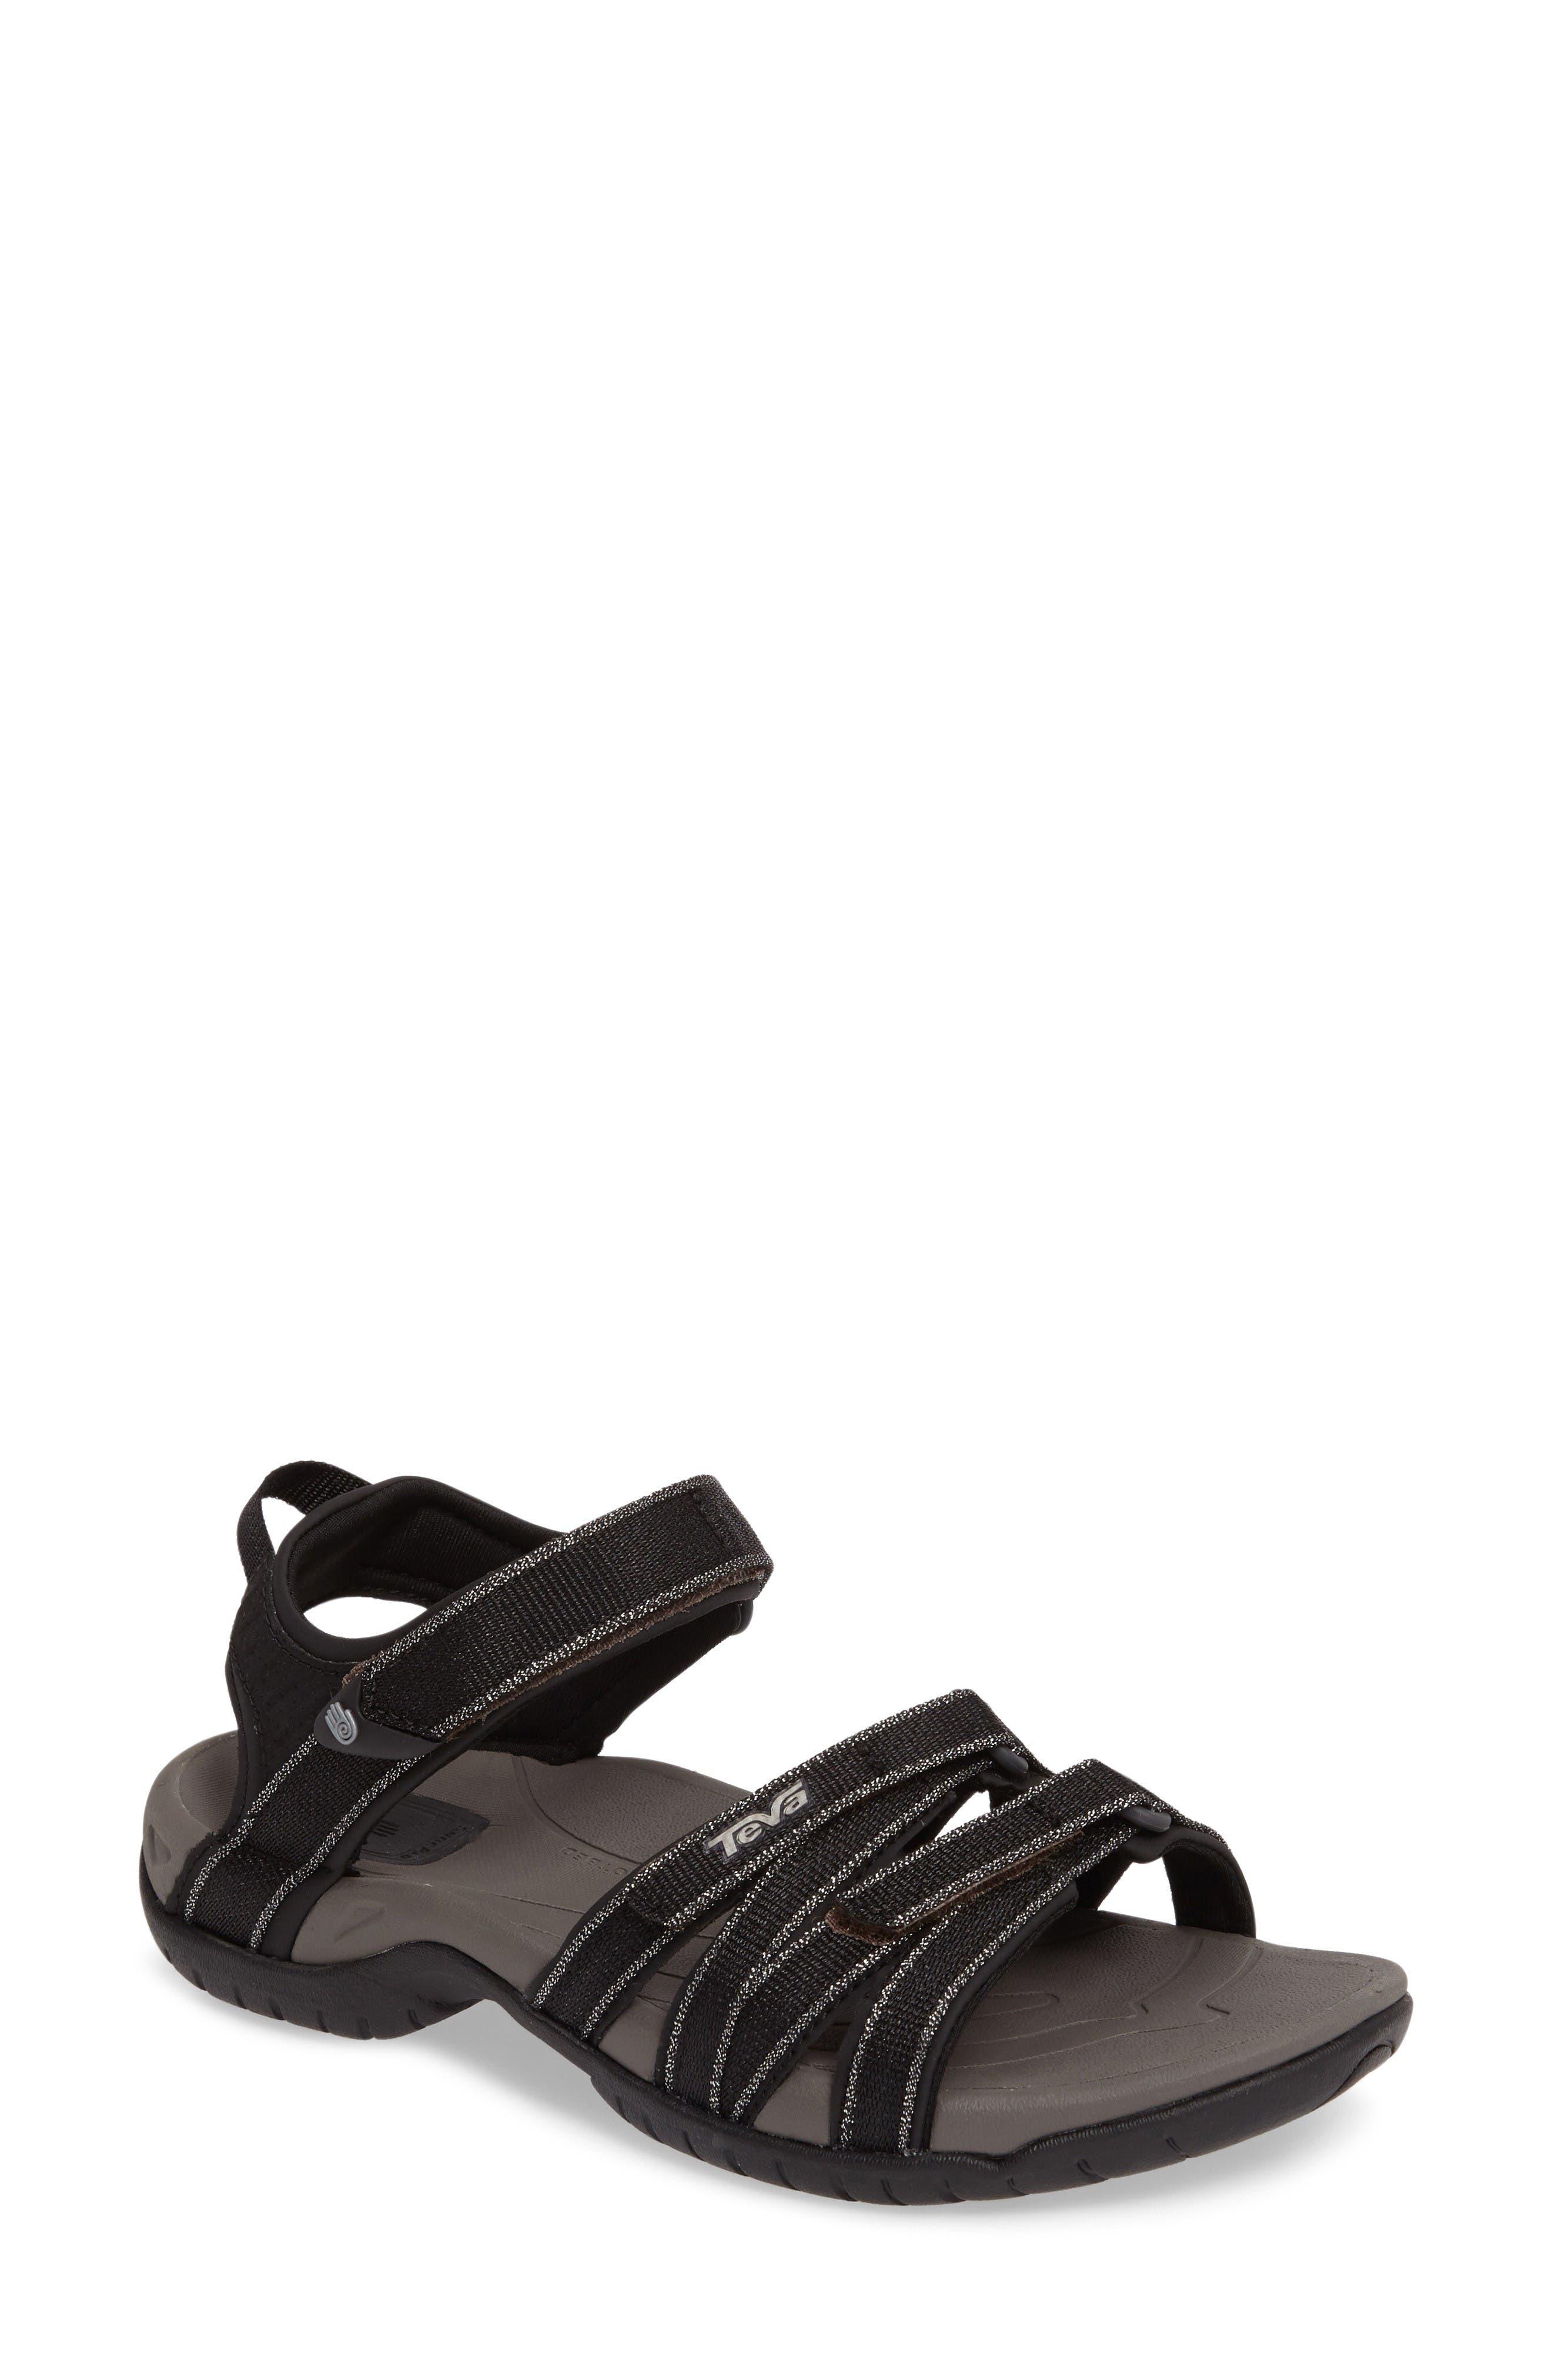 Teva Tirra Metallic Sport Sandal (Women)